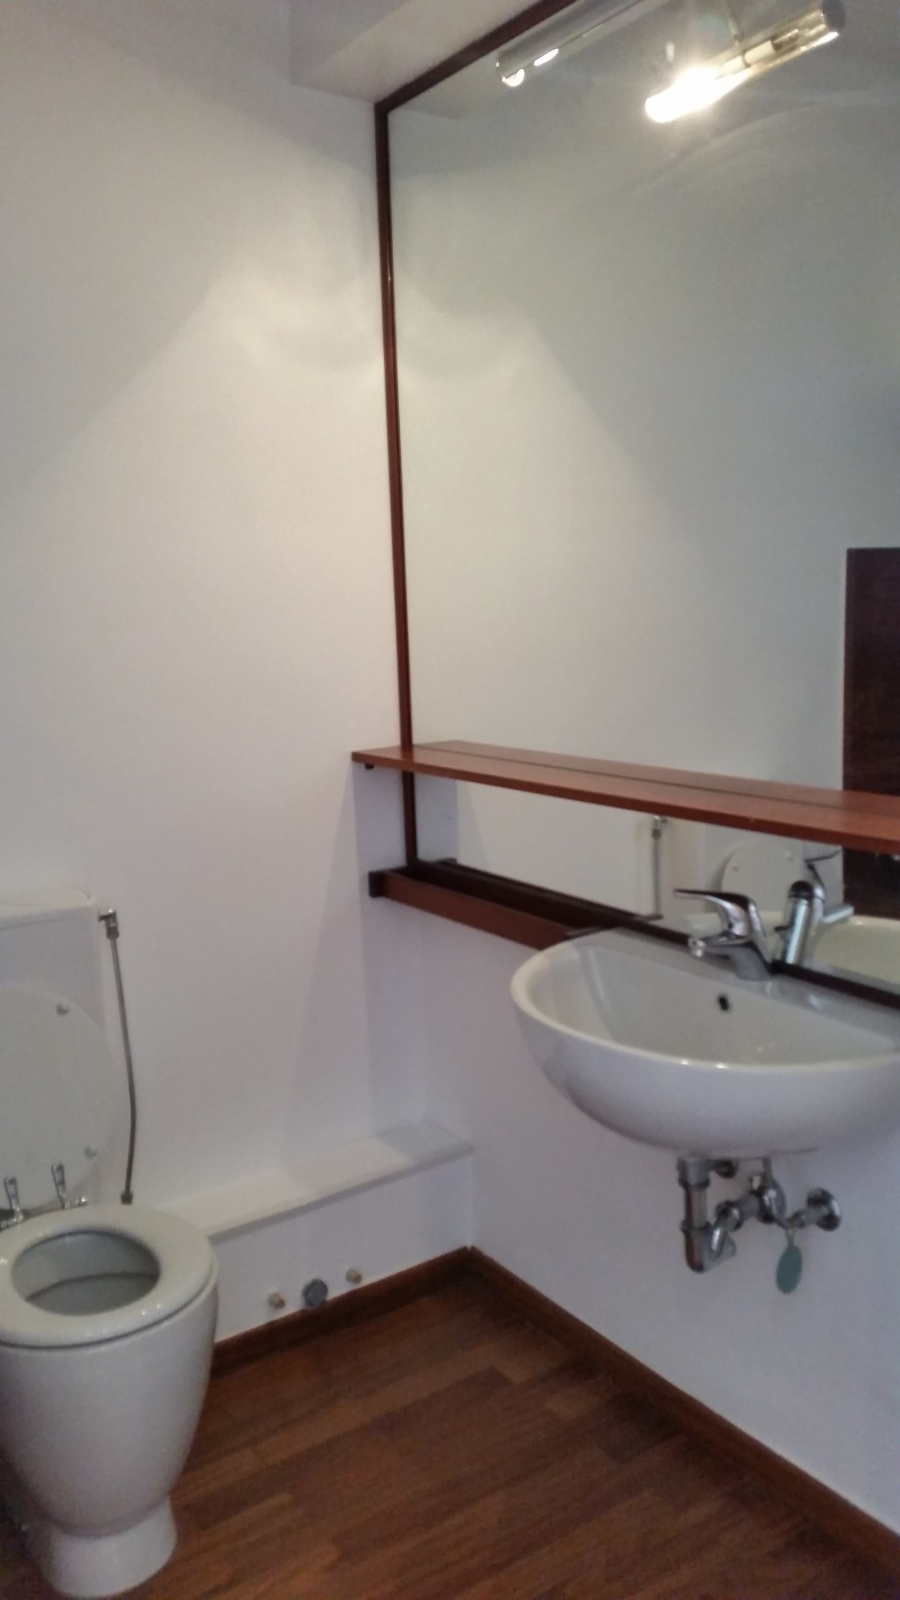 location monaco palais de la scala studio monaco monte carlo. Black Bedroom Furniture Sets. Home Design Ideas